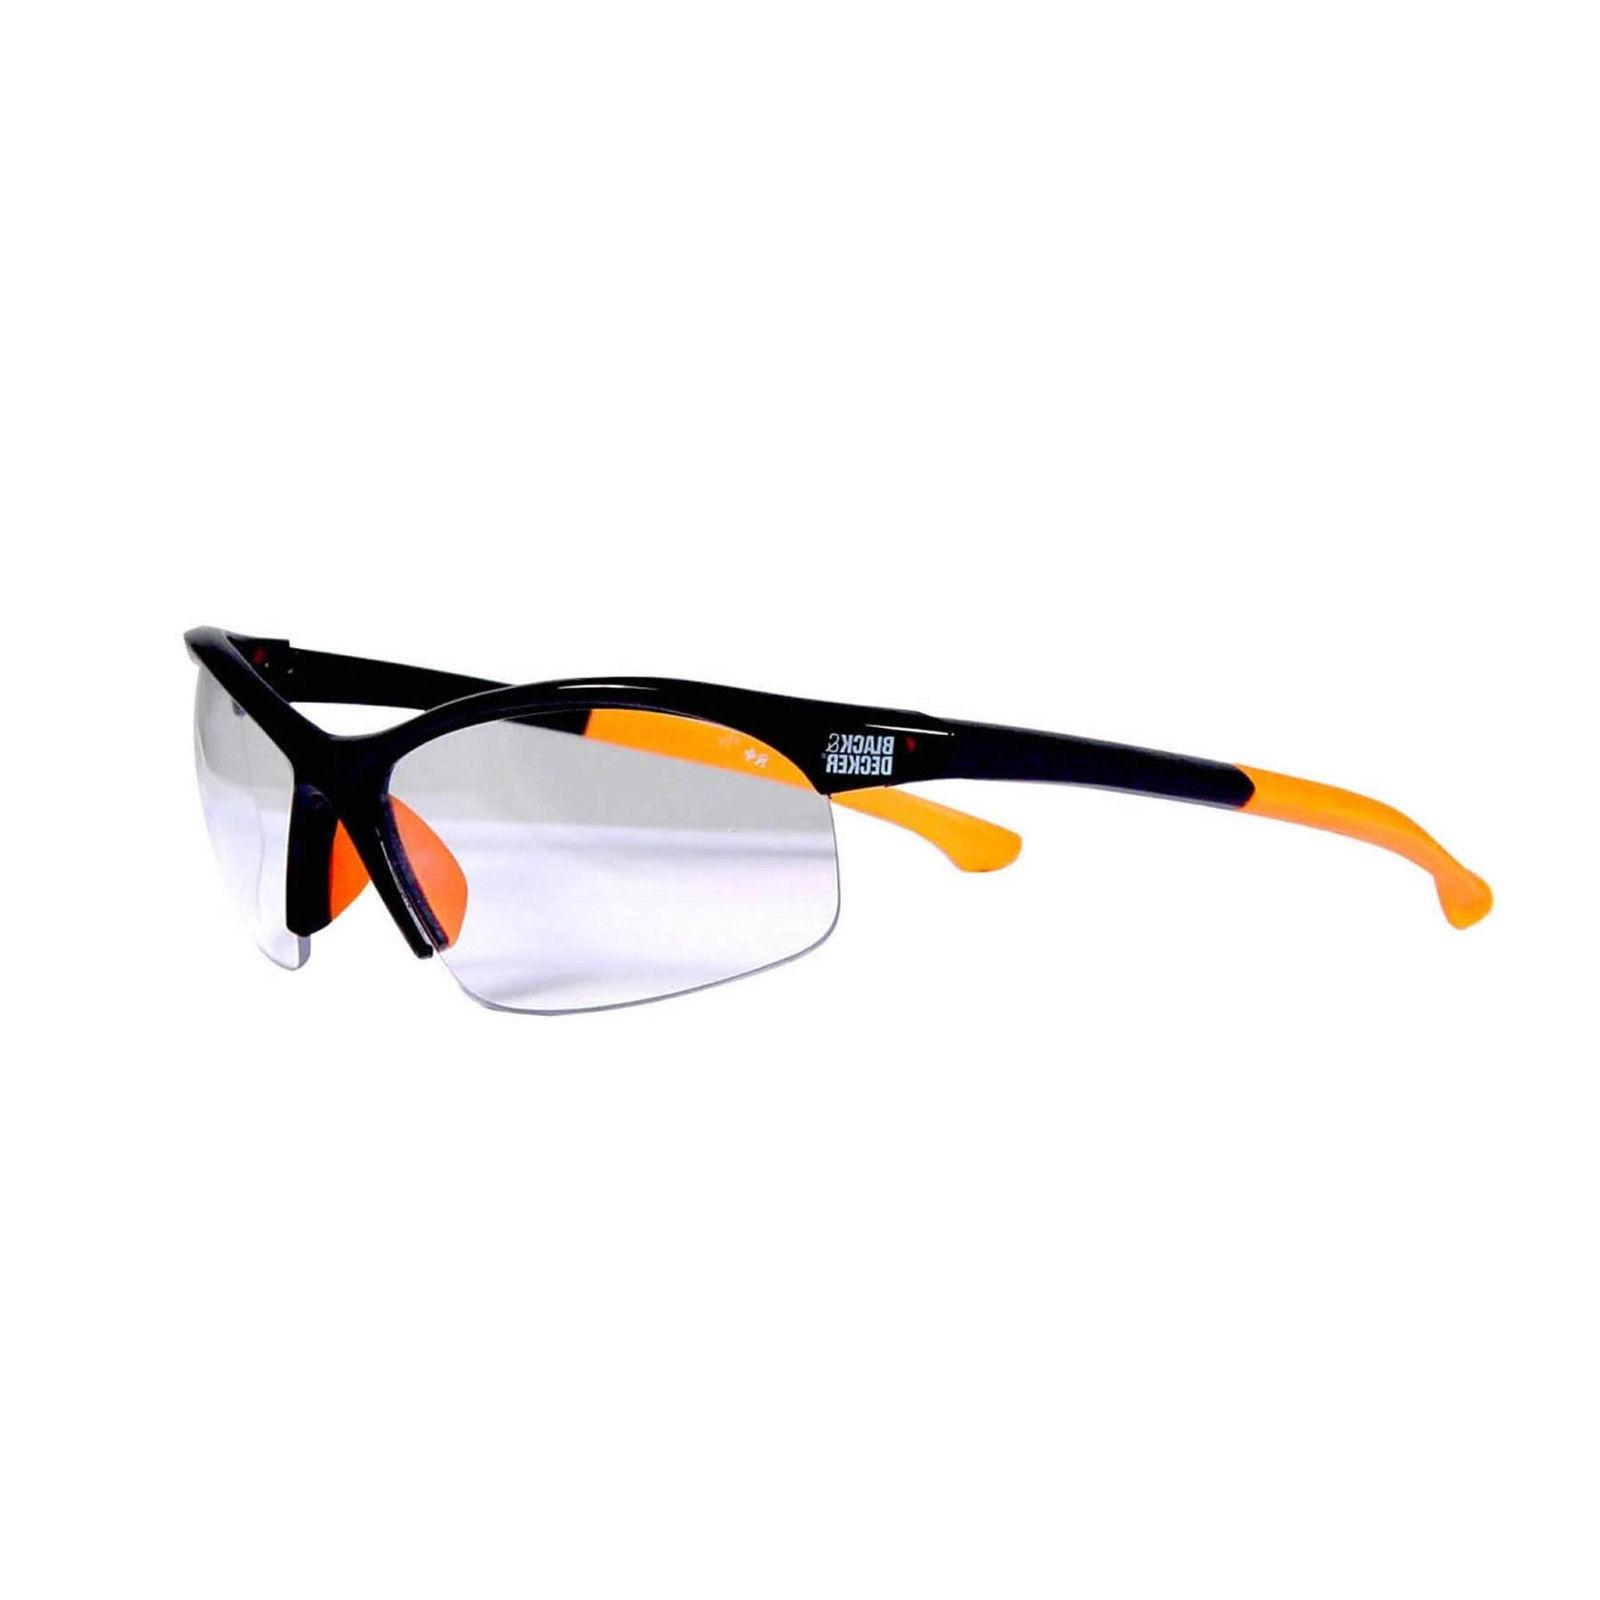 Black Safety Glasses Frames In Smoke Lense